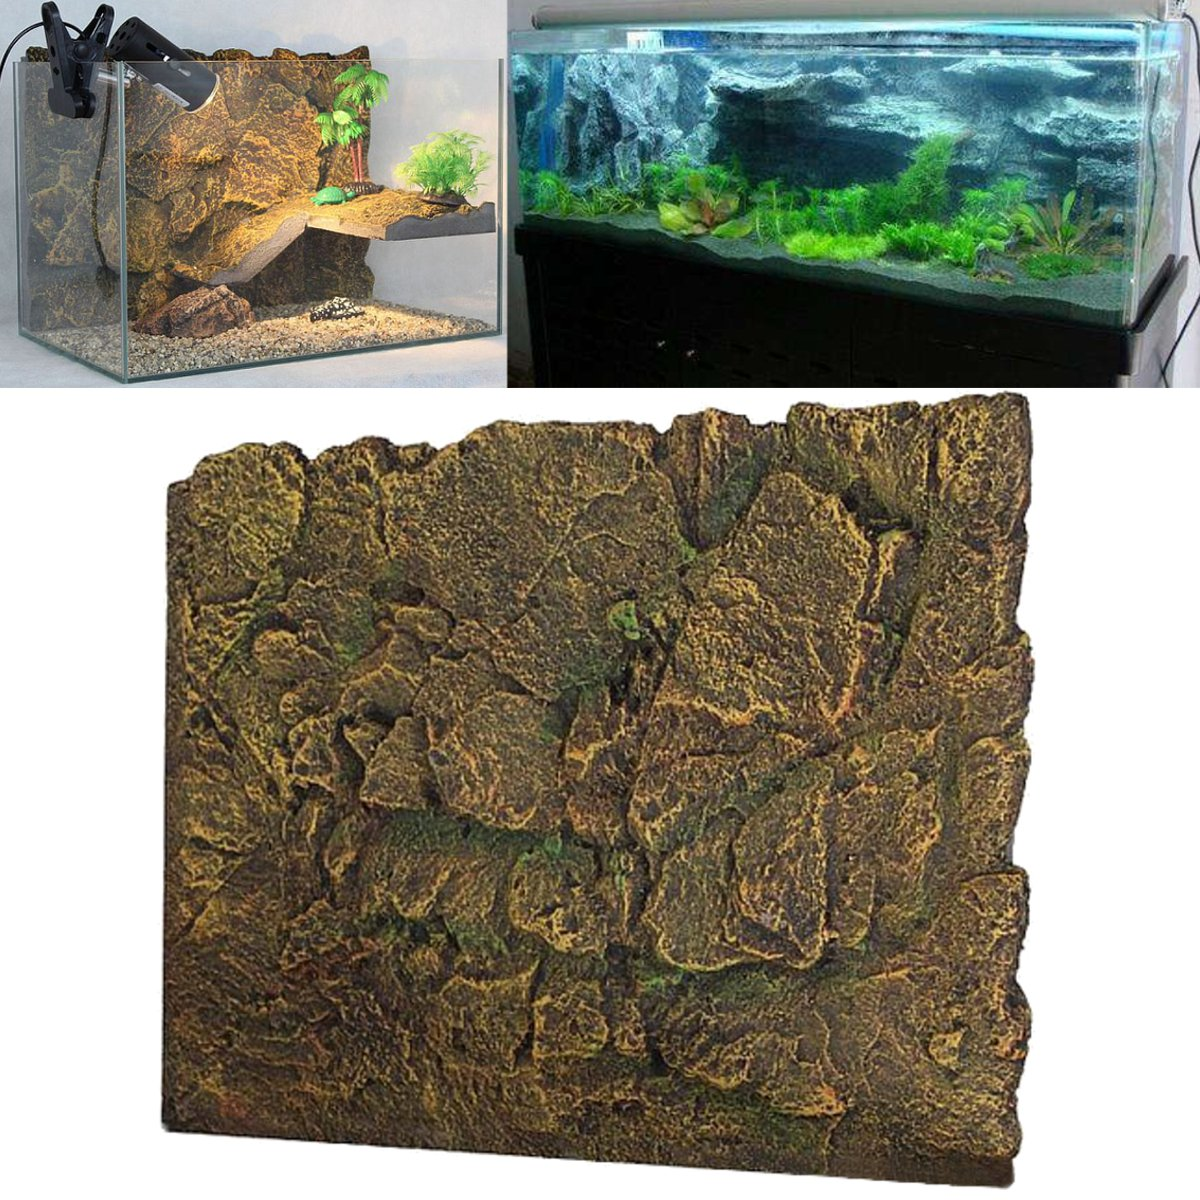 3d Pu Rock Reptile Aquarium Fish Tank Background Backdrop Board Decor 60x45cm Buy Sell Online Best Prices In Srilanka Daraz Lk